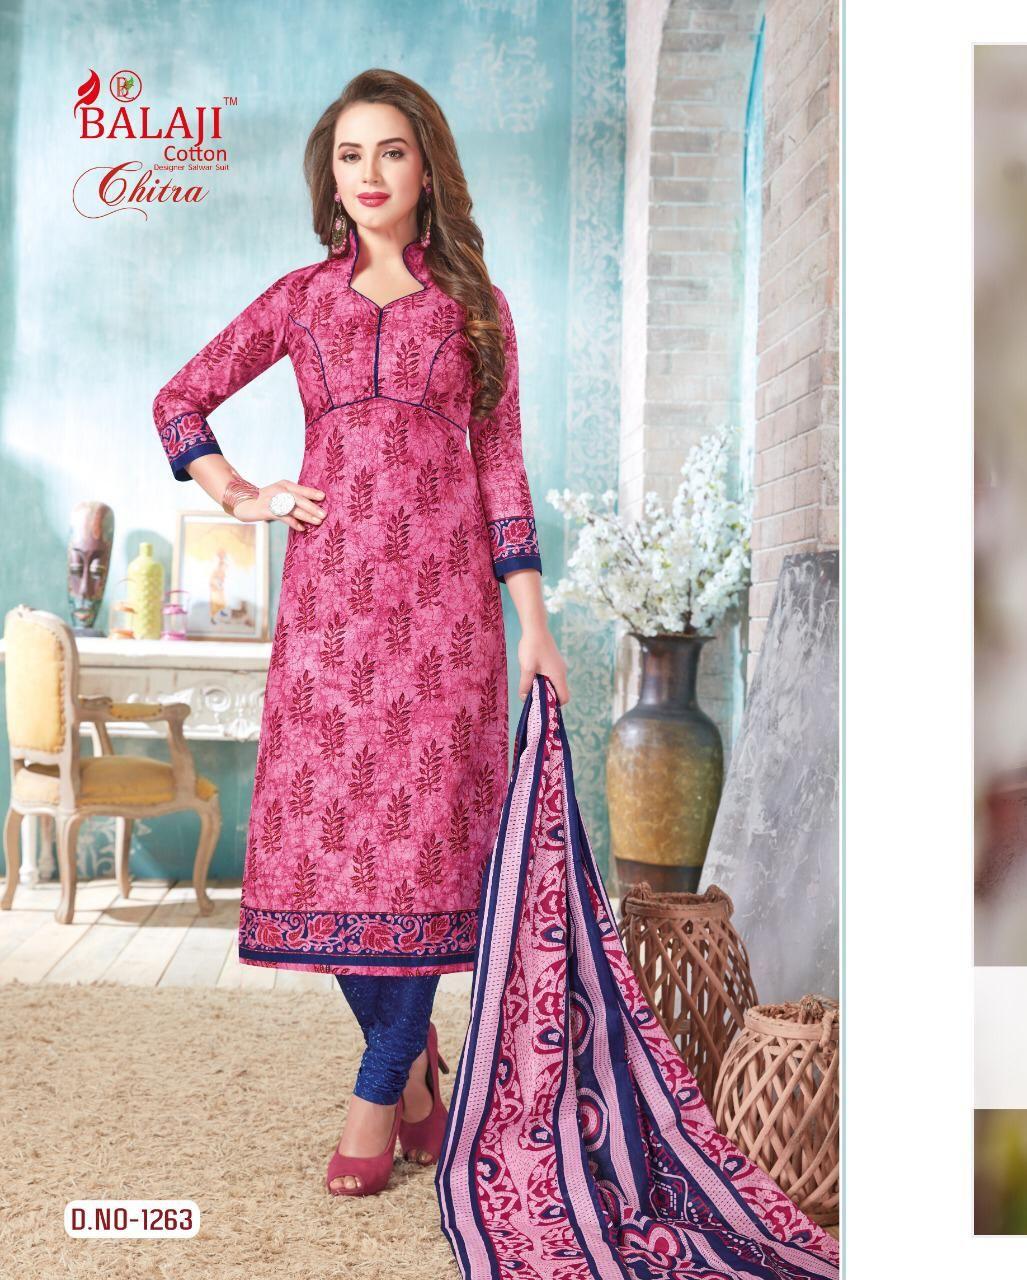 cb116bdc5d Balaji Cotton Chitra Vol 21 Salwar suit Wholesale Catalog 20 Pcs in ...